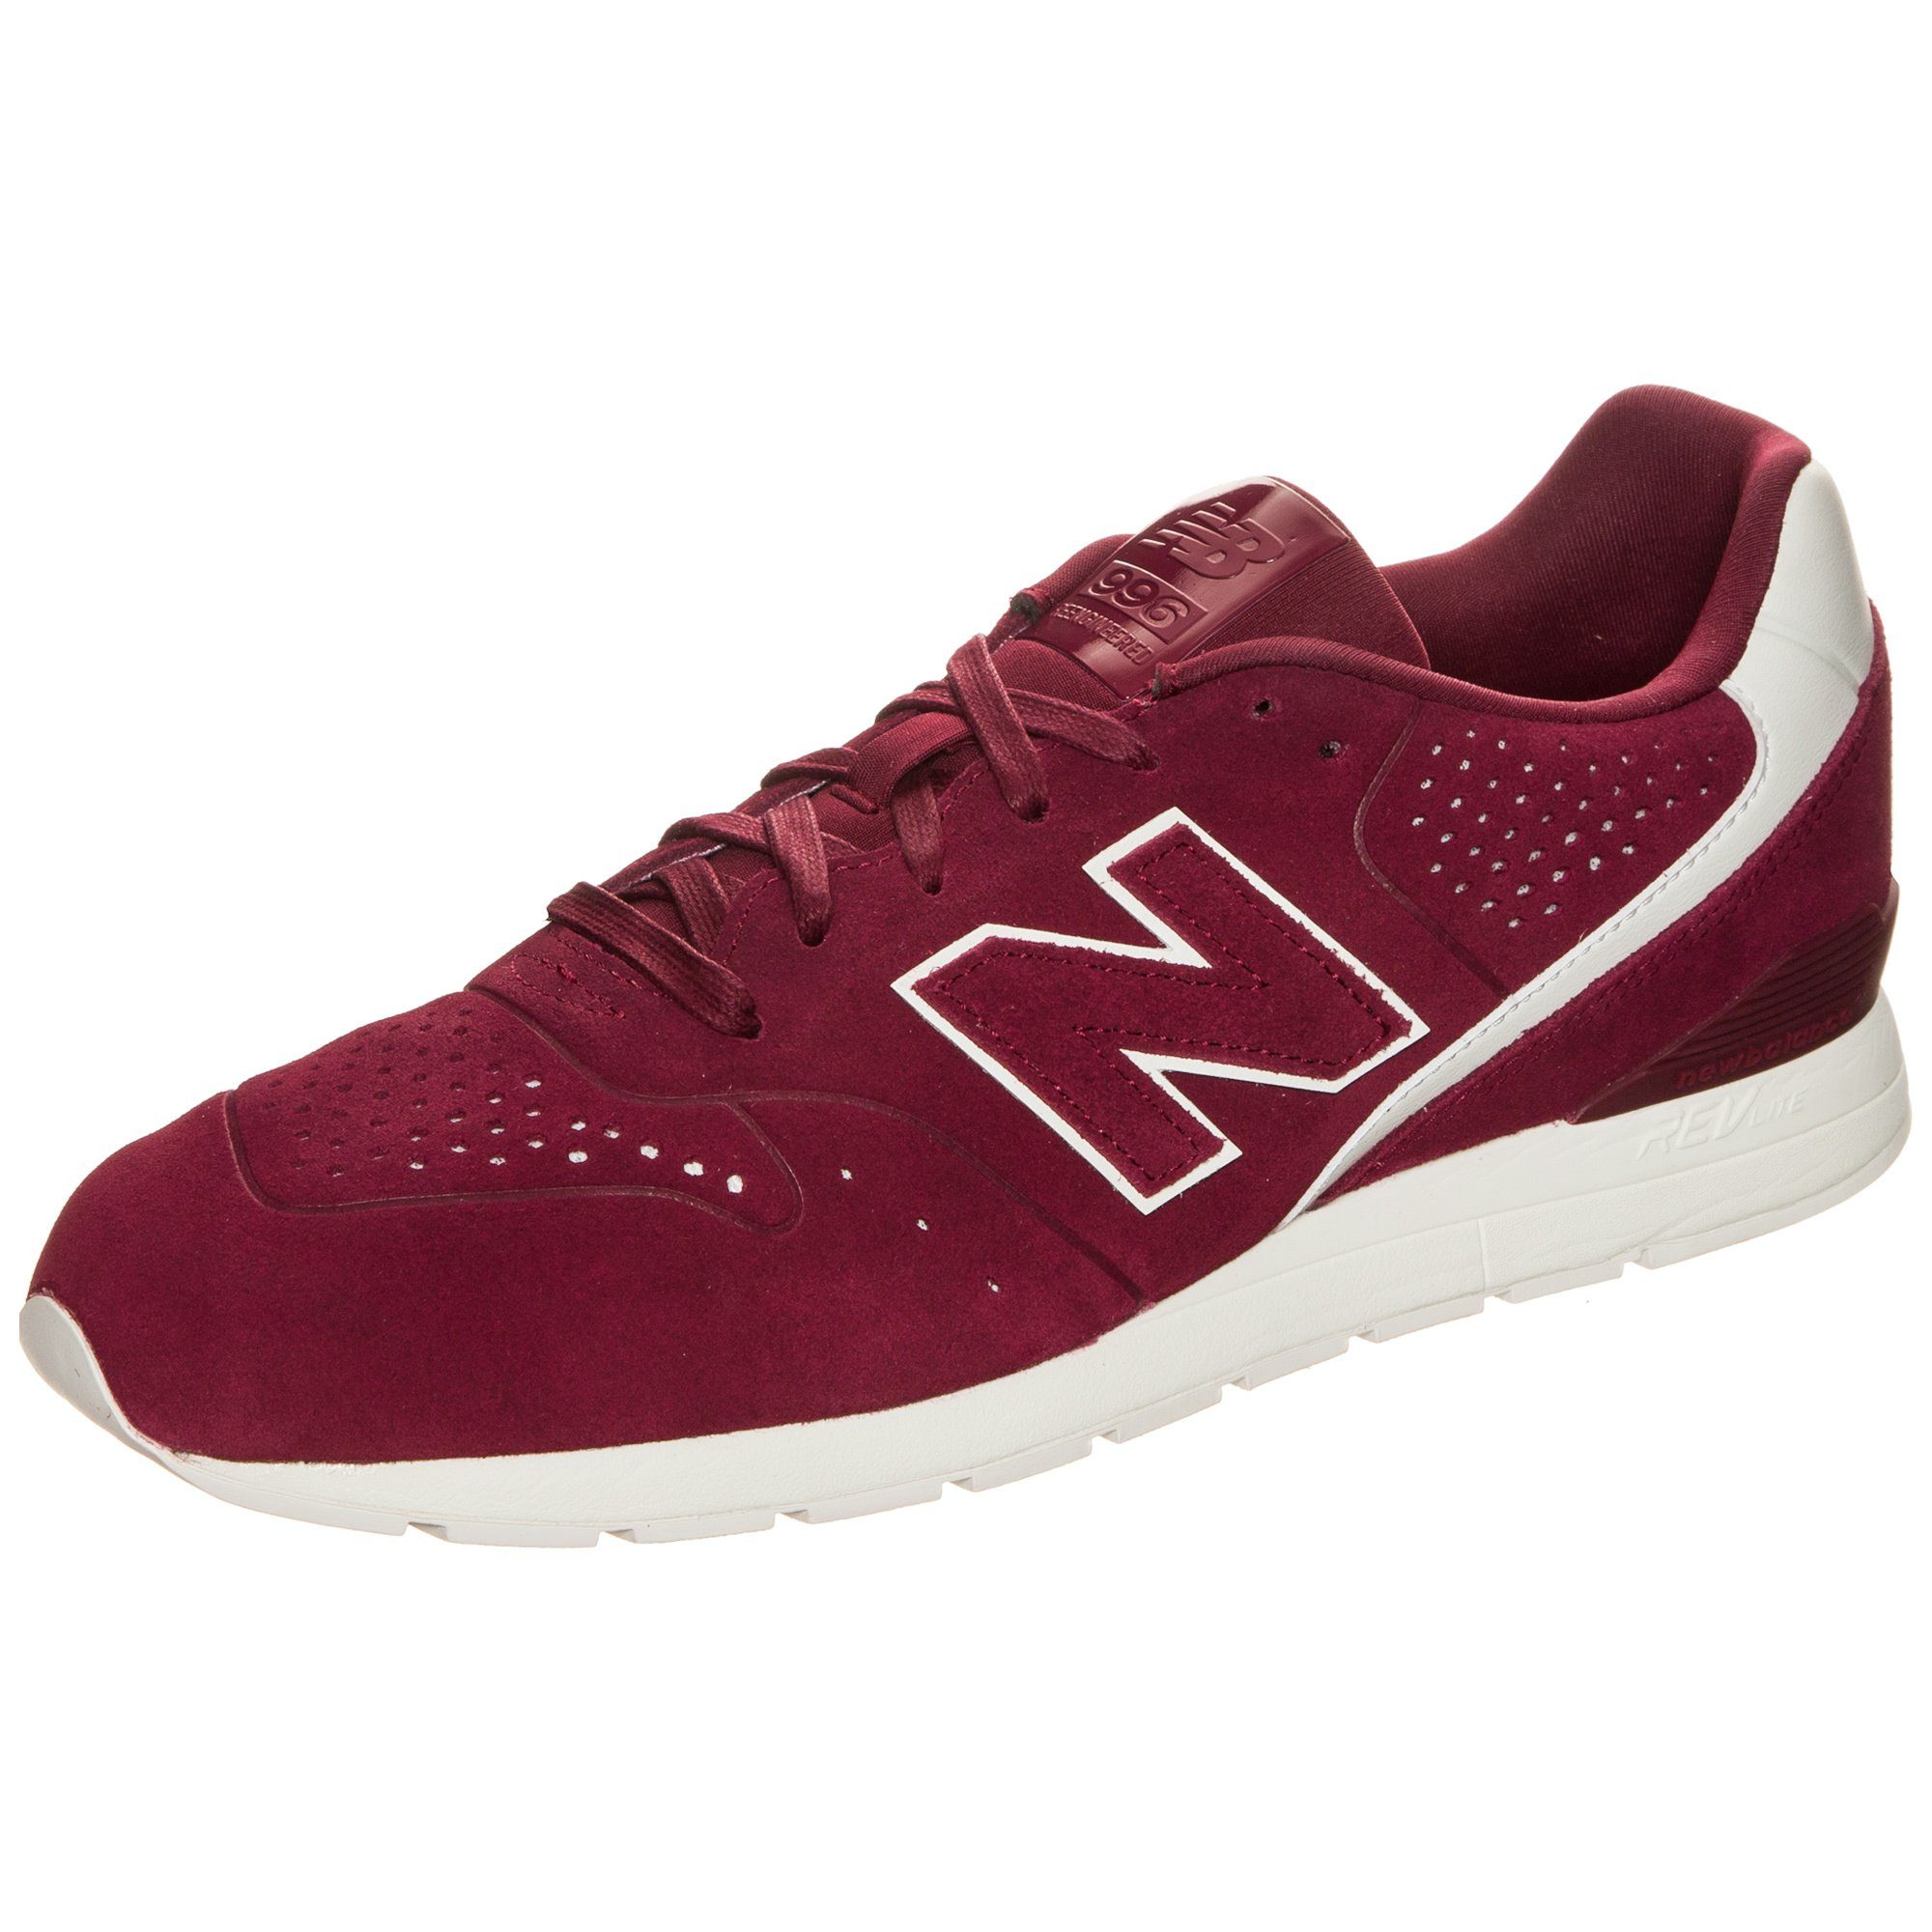 New Balance MRL996-DU-D Sneaker Herren kaufen  bordeaux #ft5_slash# weiß